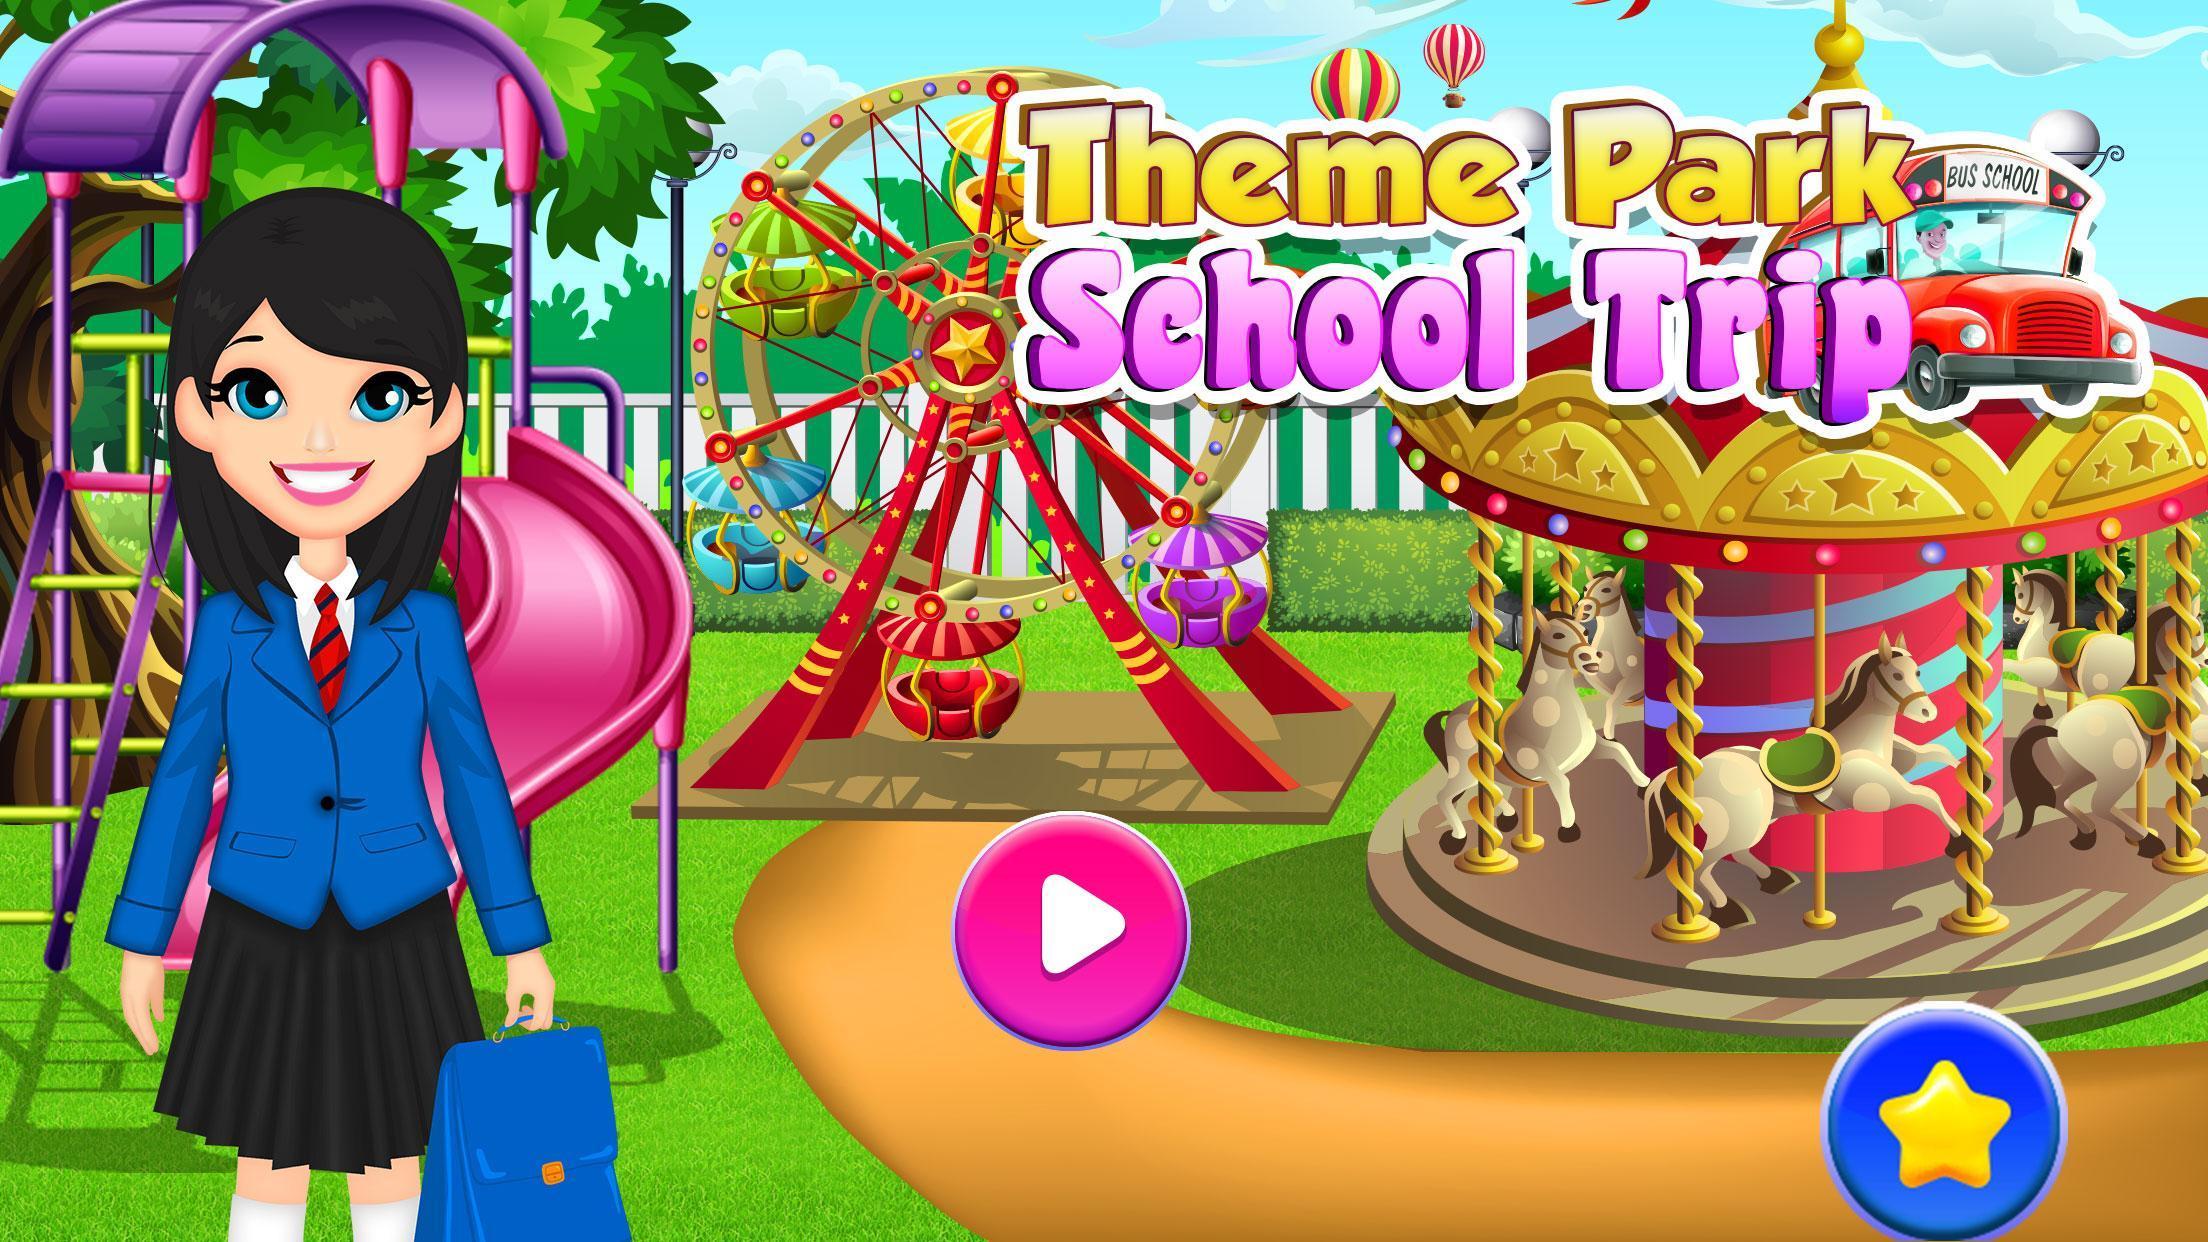 Theme Park School Trip Summer Picnic Adventure 1.0.5 Screenshot 7